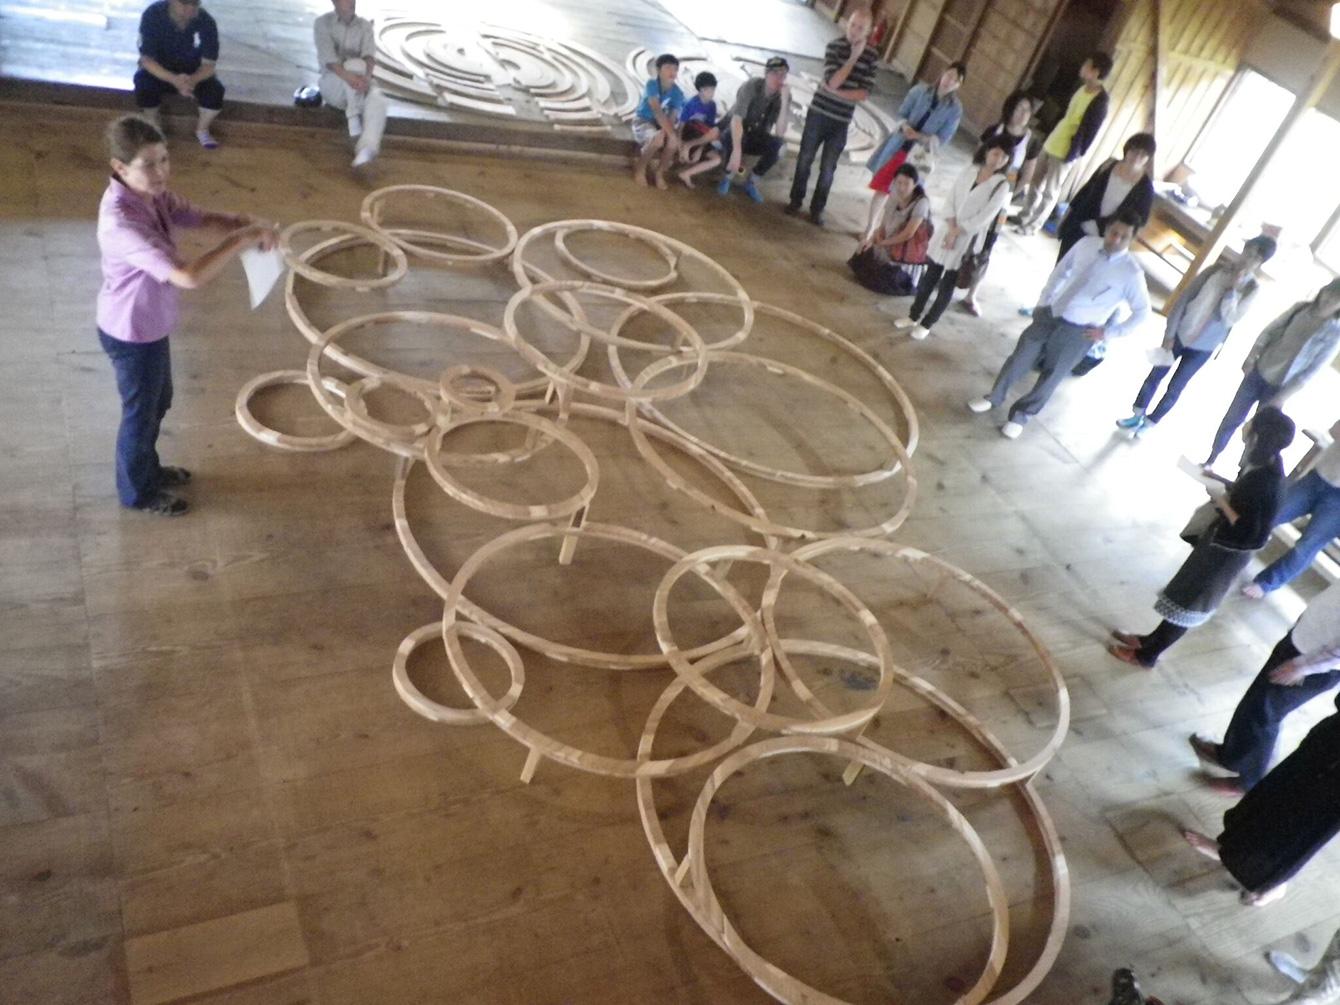 KAIR(神山アーティスト・イン・レジデンス)2013年度招聘作家のアトリエにて行われた、アーティストトーク。作品作りのお手伝いもさせていただいた。